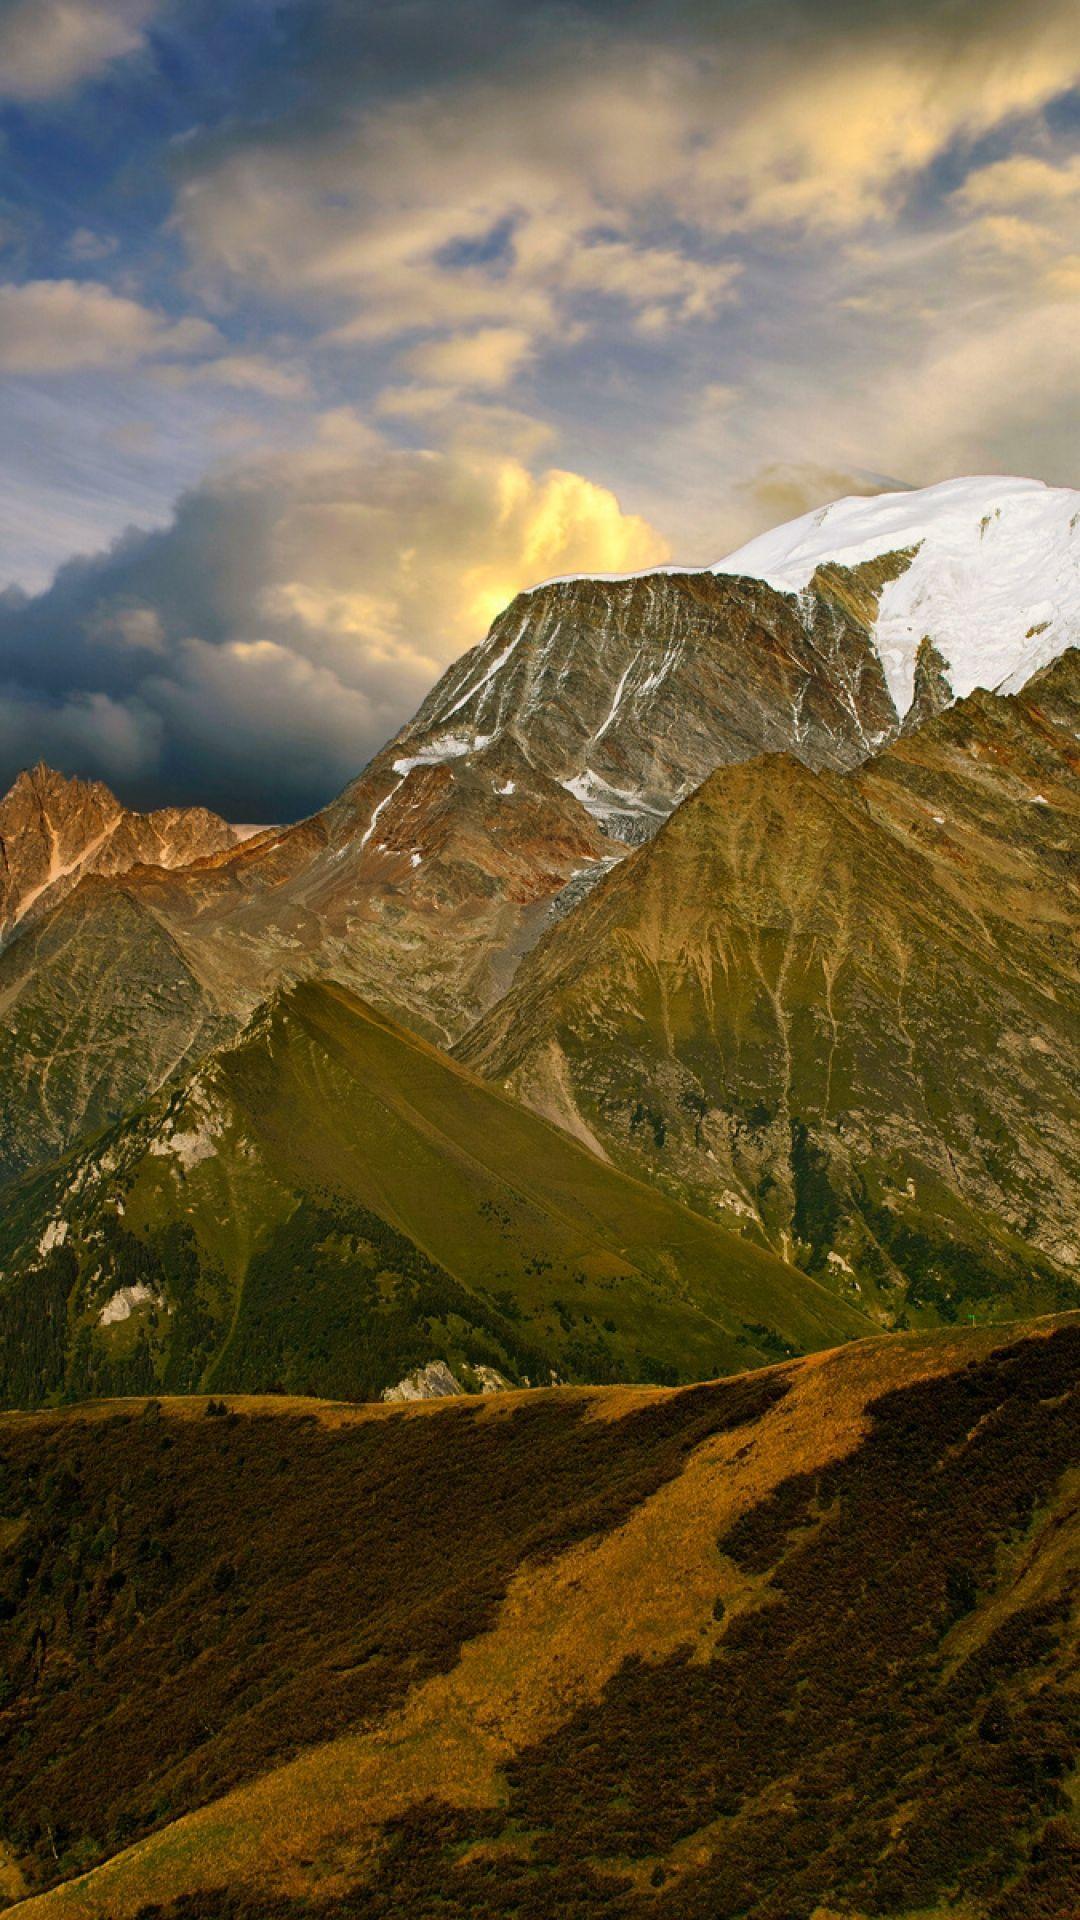 Download Wallpaper 1080x1920 mountains clouds sky orange decline